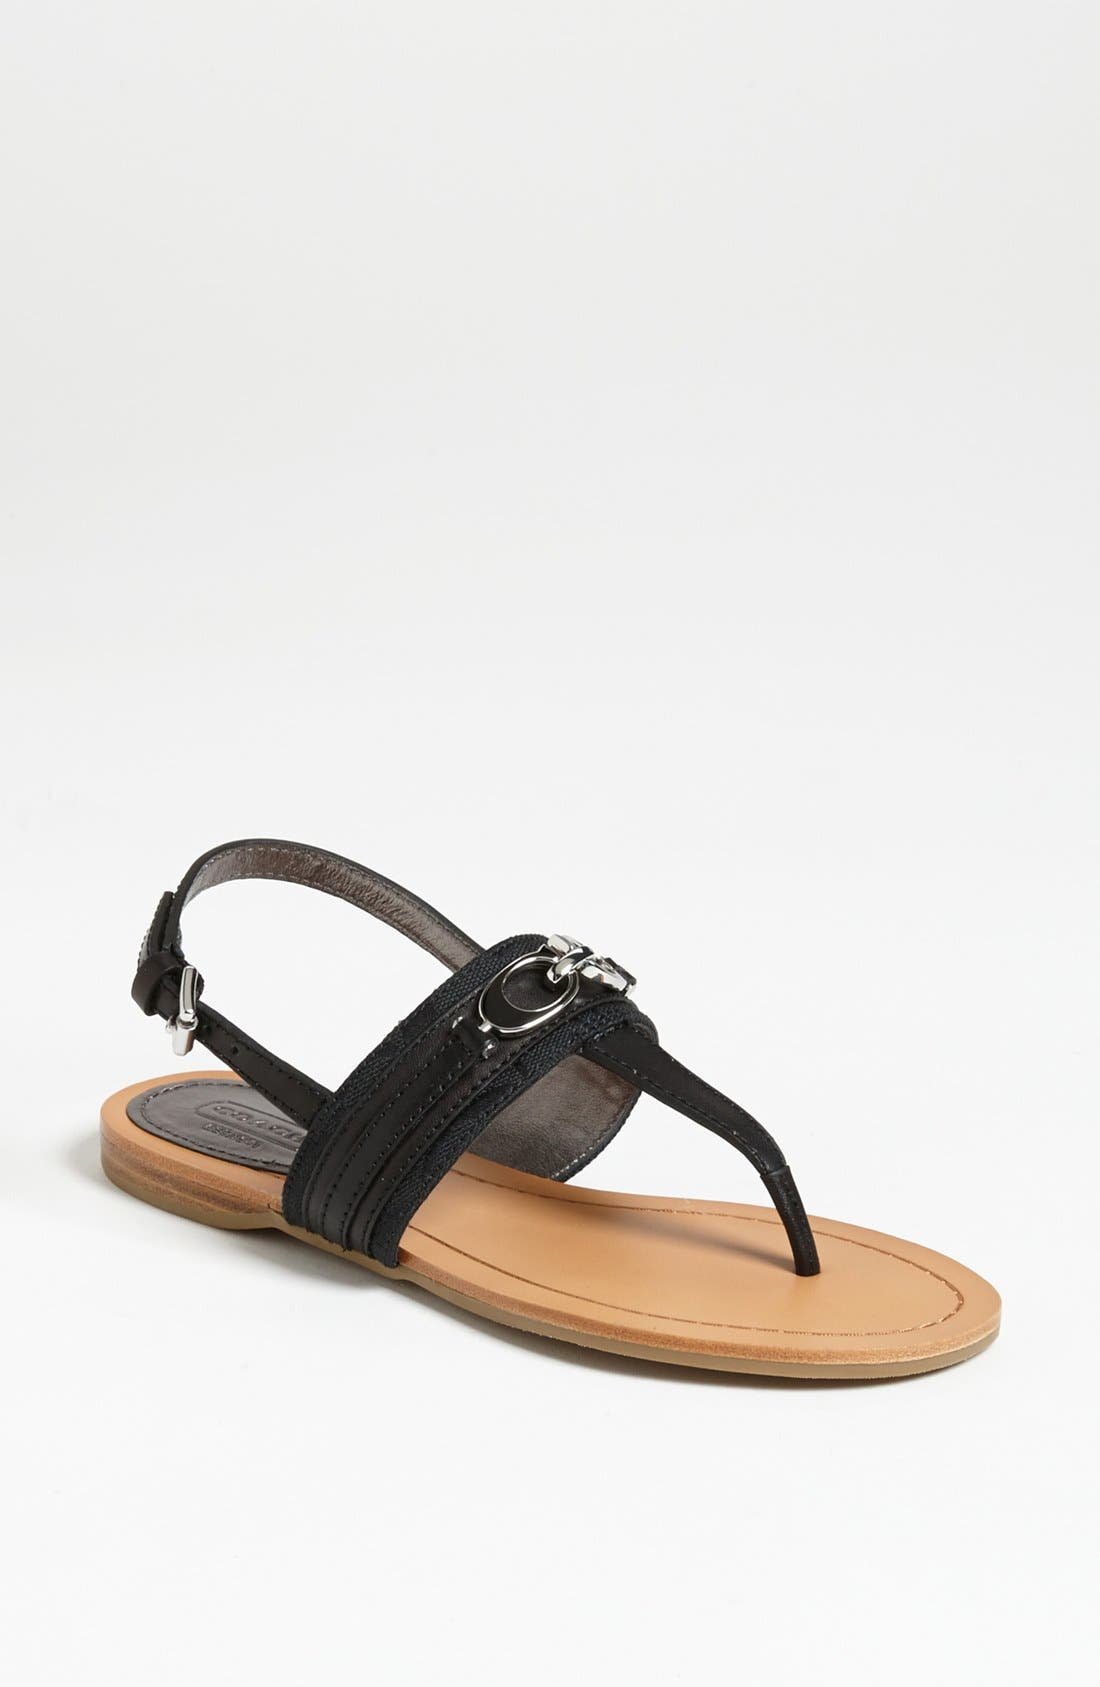 Alternate Image 1 Selected - COACH 'Sammy' Sandal